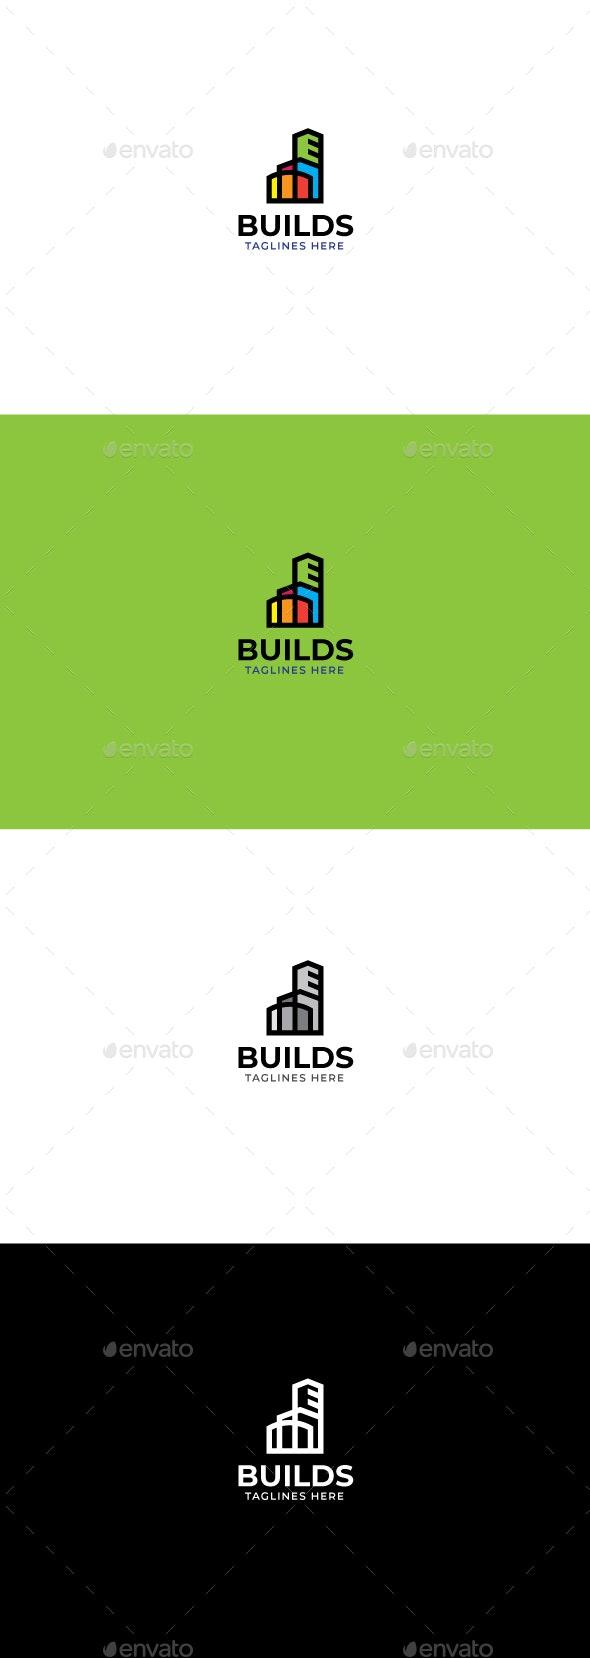 Buildings logo template